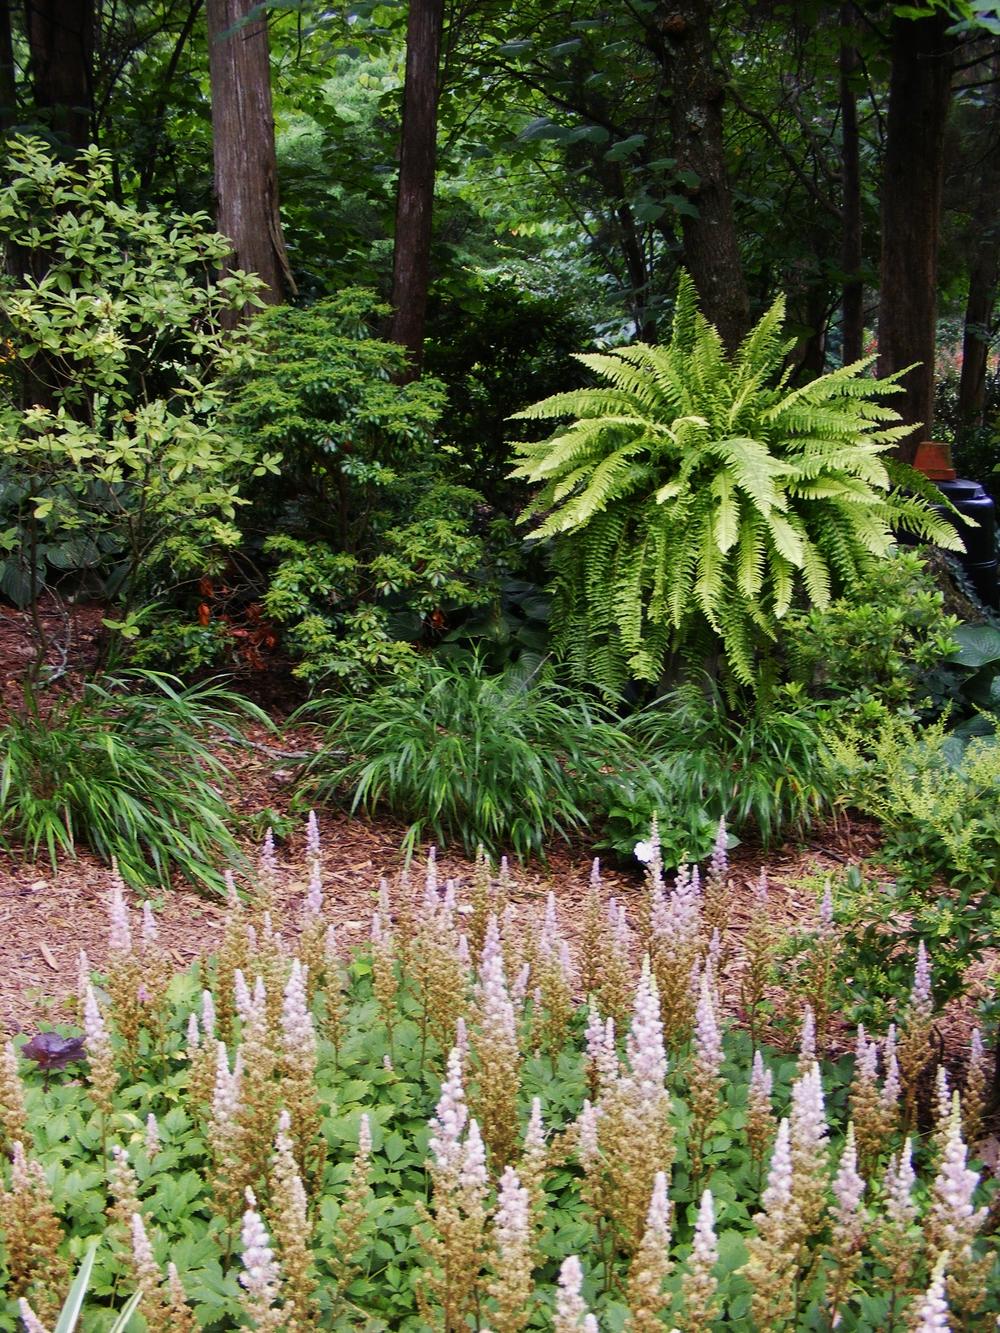 'Rita's Gold' Boston fern